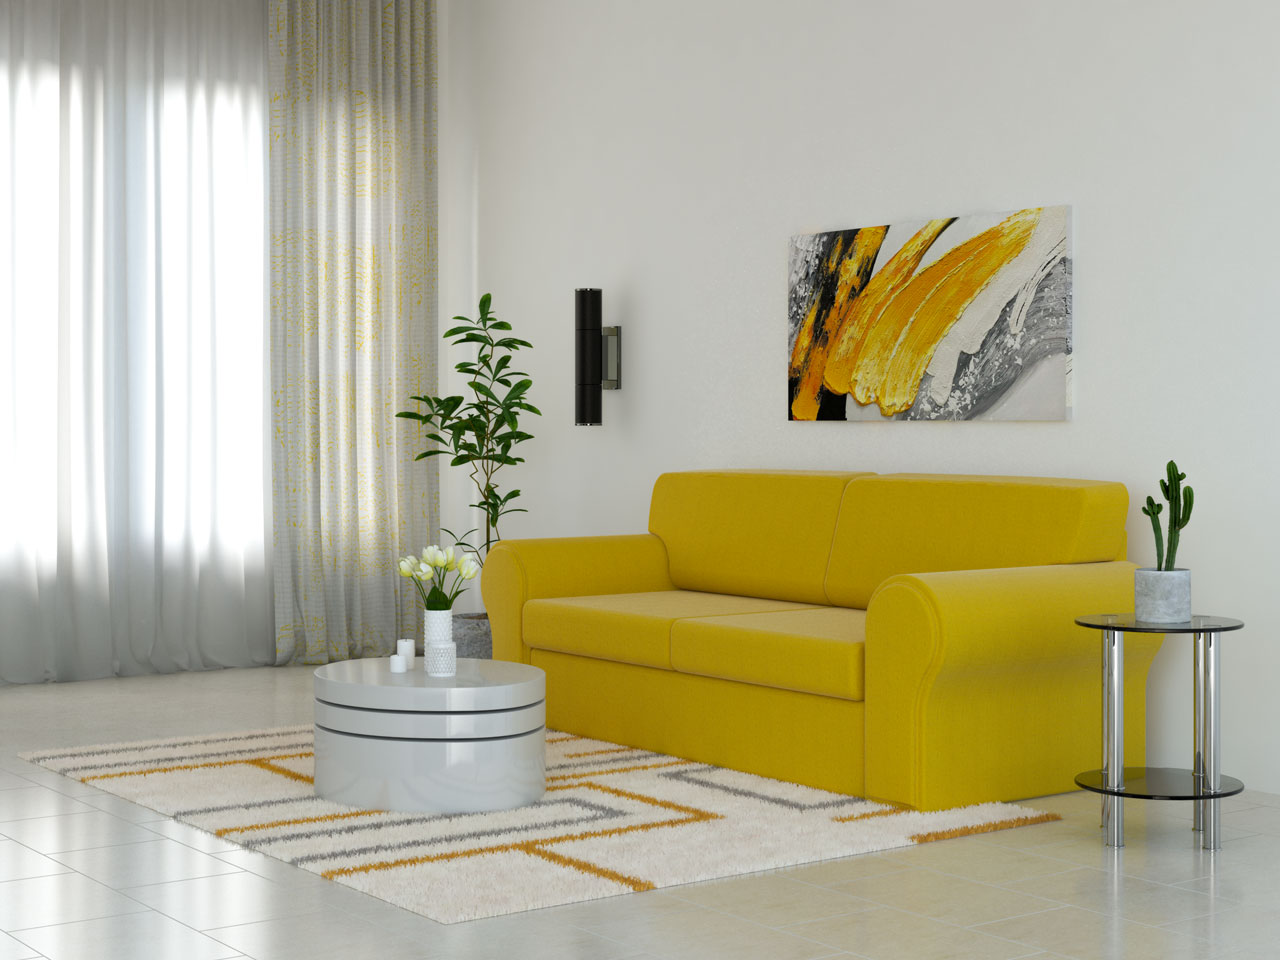 Cream and yellow rug